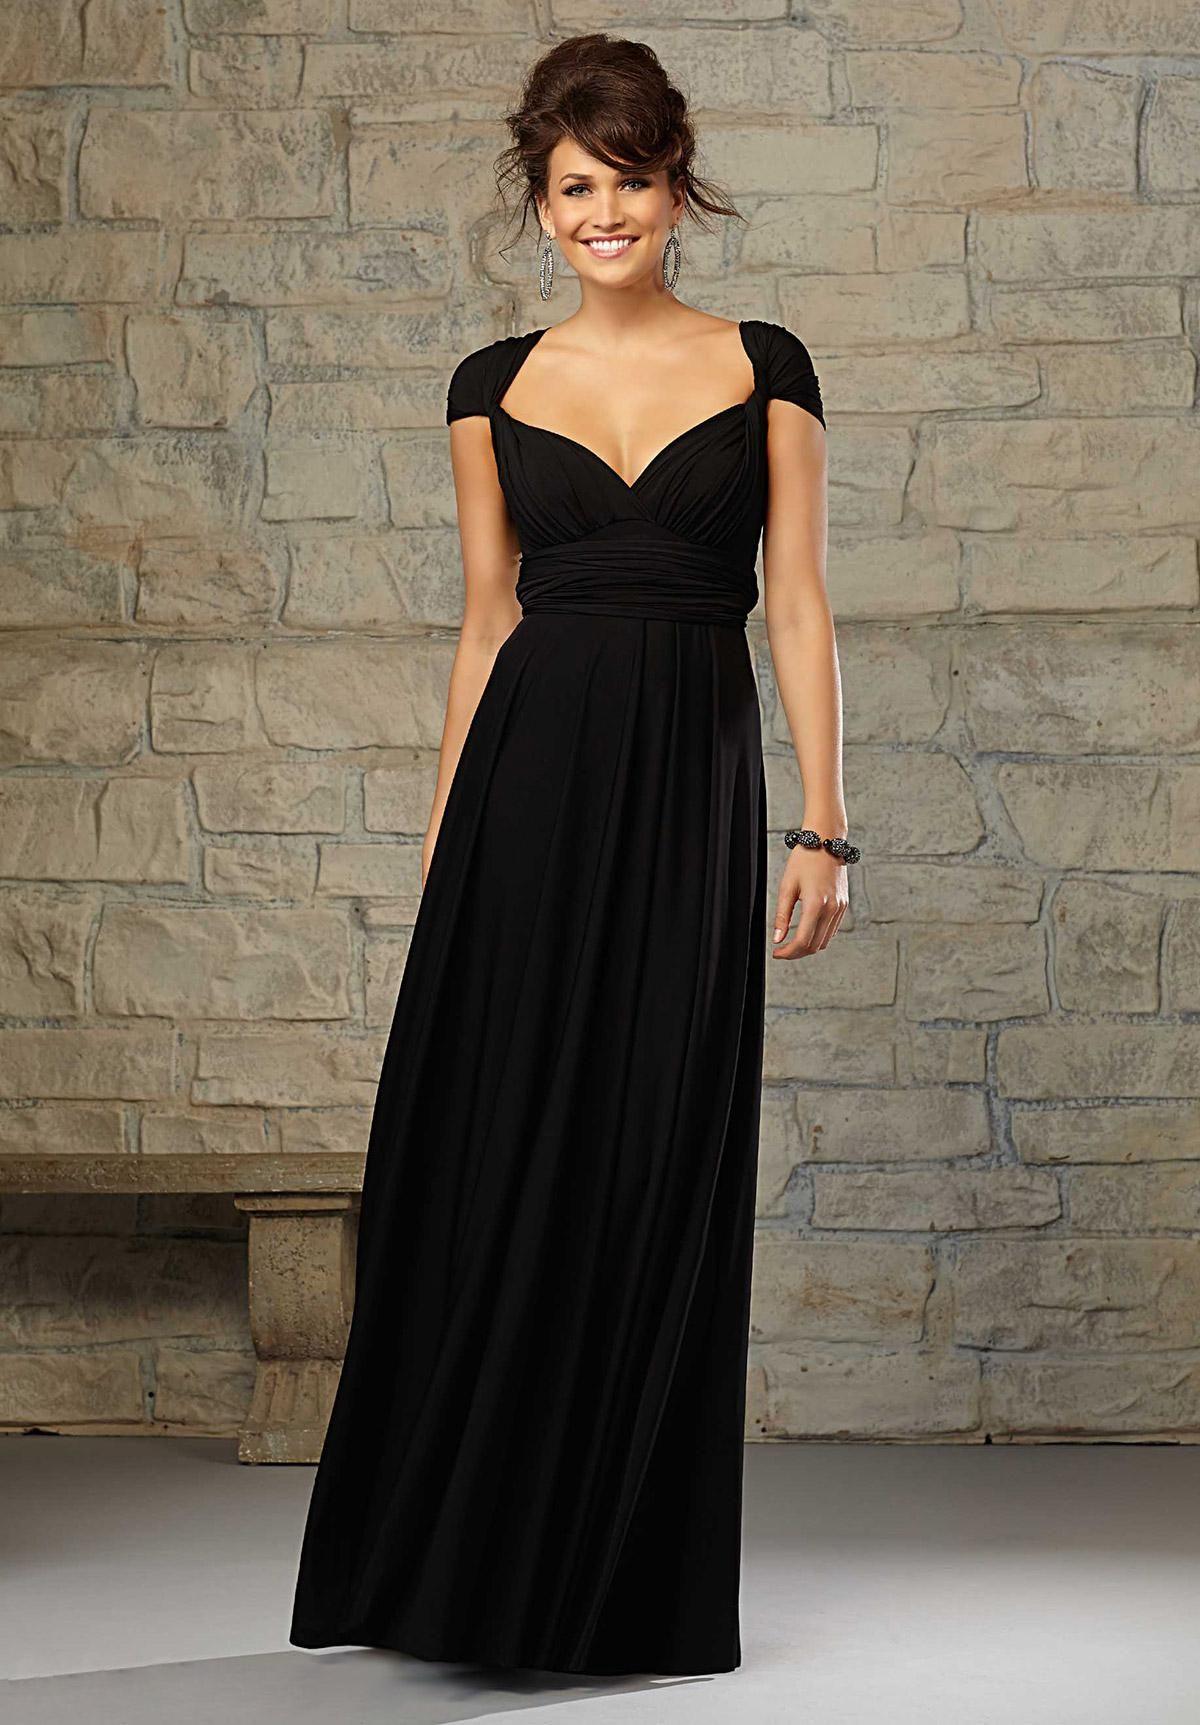 cap-sleeve-chiffon-black-dress-